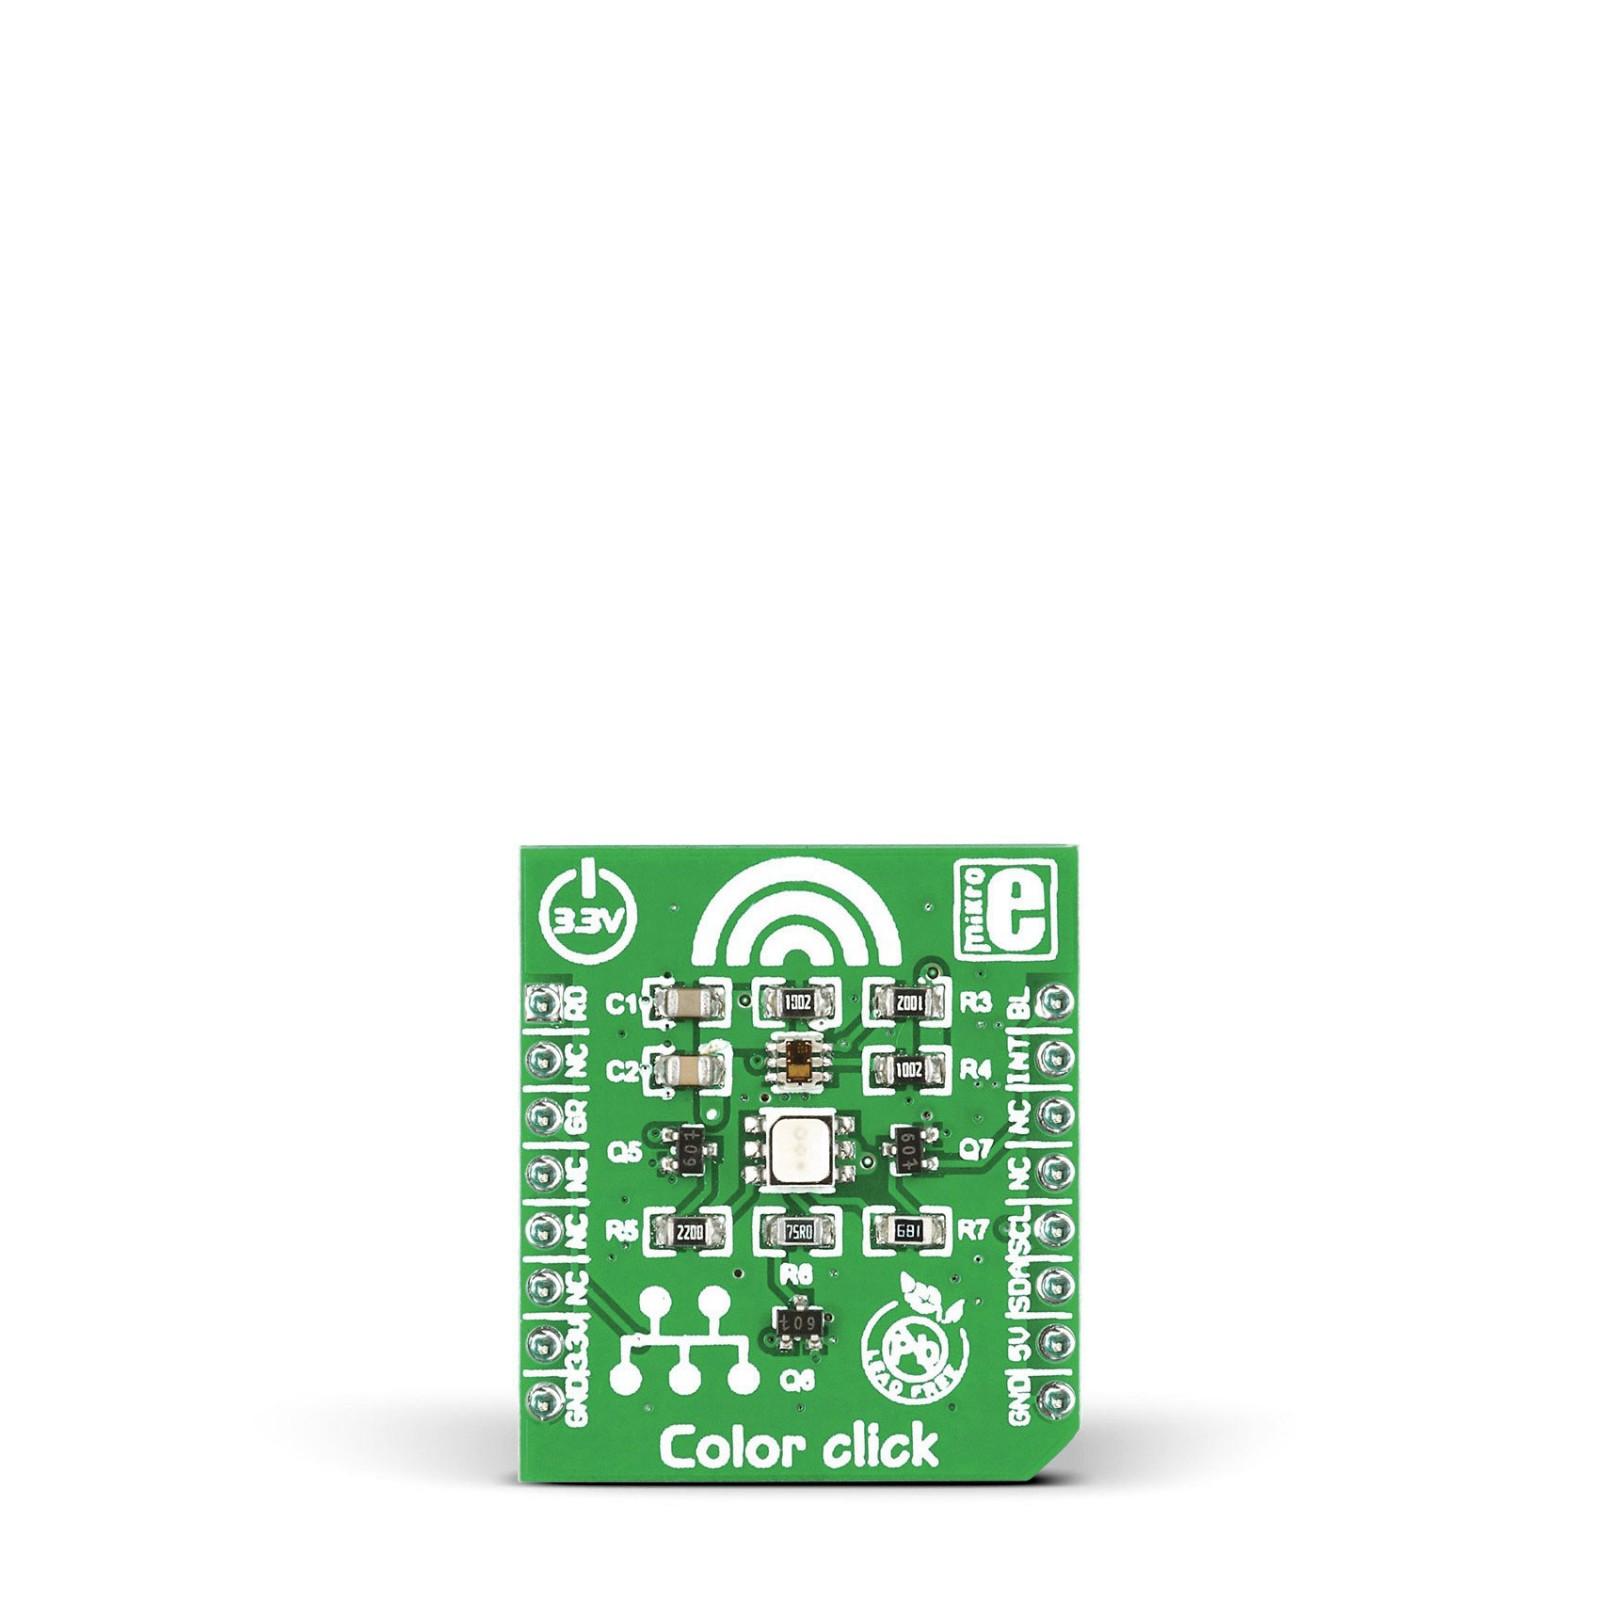 Color Click Tcs3471 Light Sensor With Rgb Led Diode Driver Chip Application Circuit I2c Interface Mgctlbxnmzp Mgctlbxv5112 Mgctlbxlc Mgctlbxpprestashop